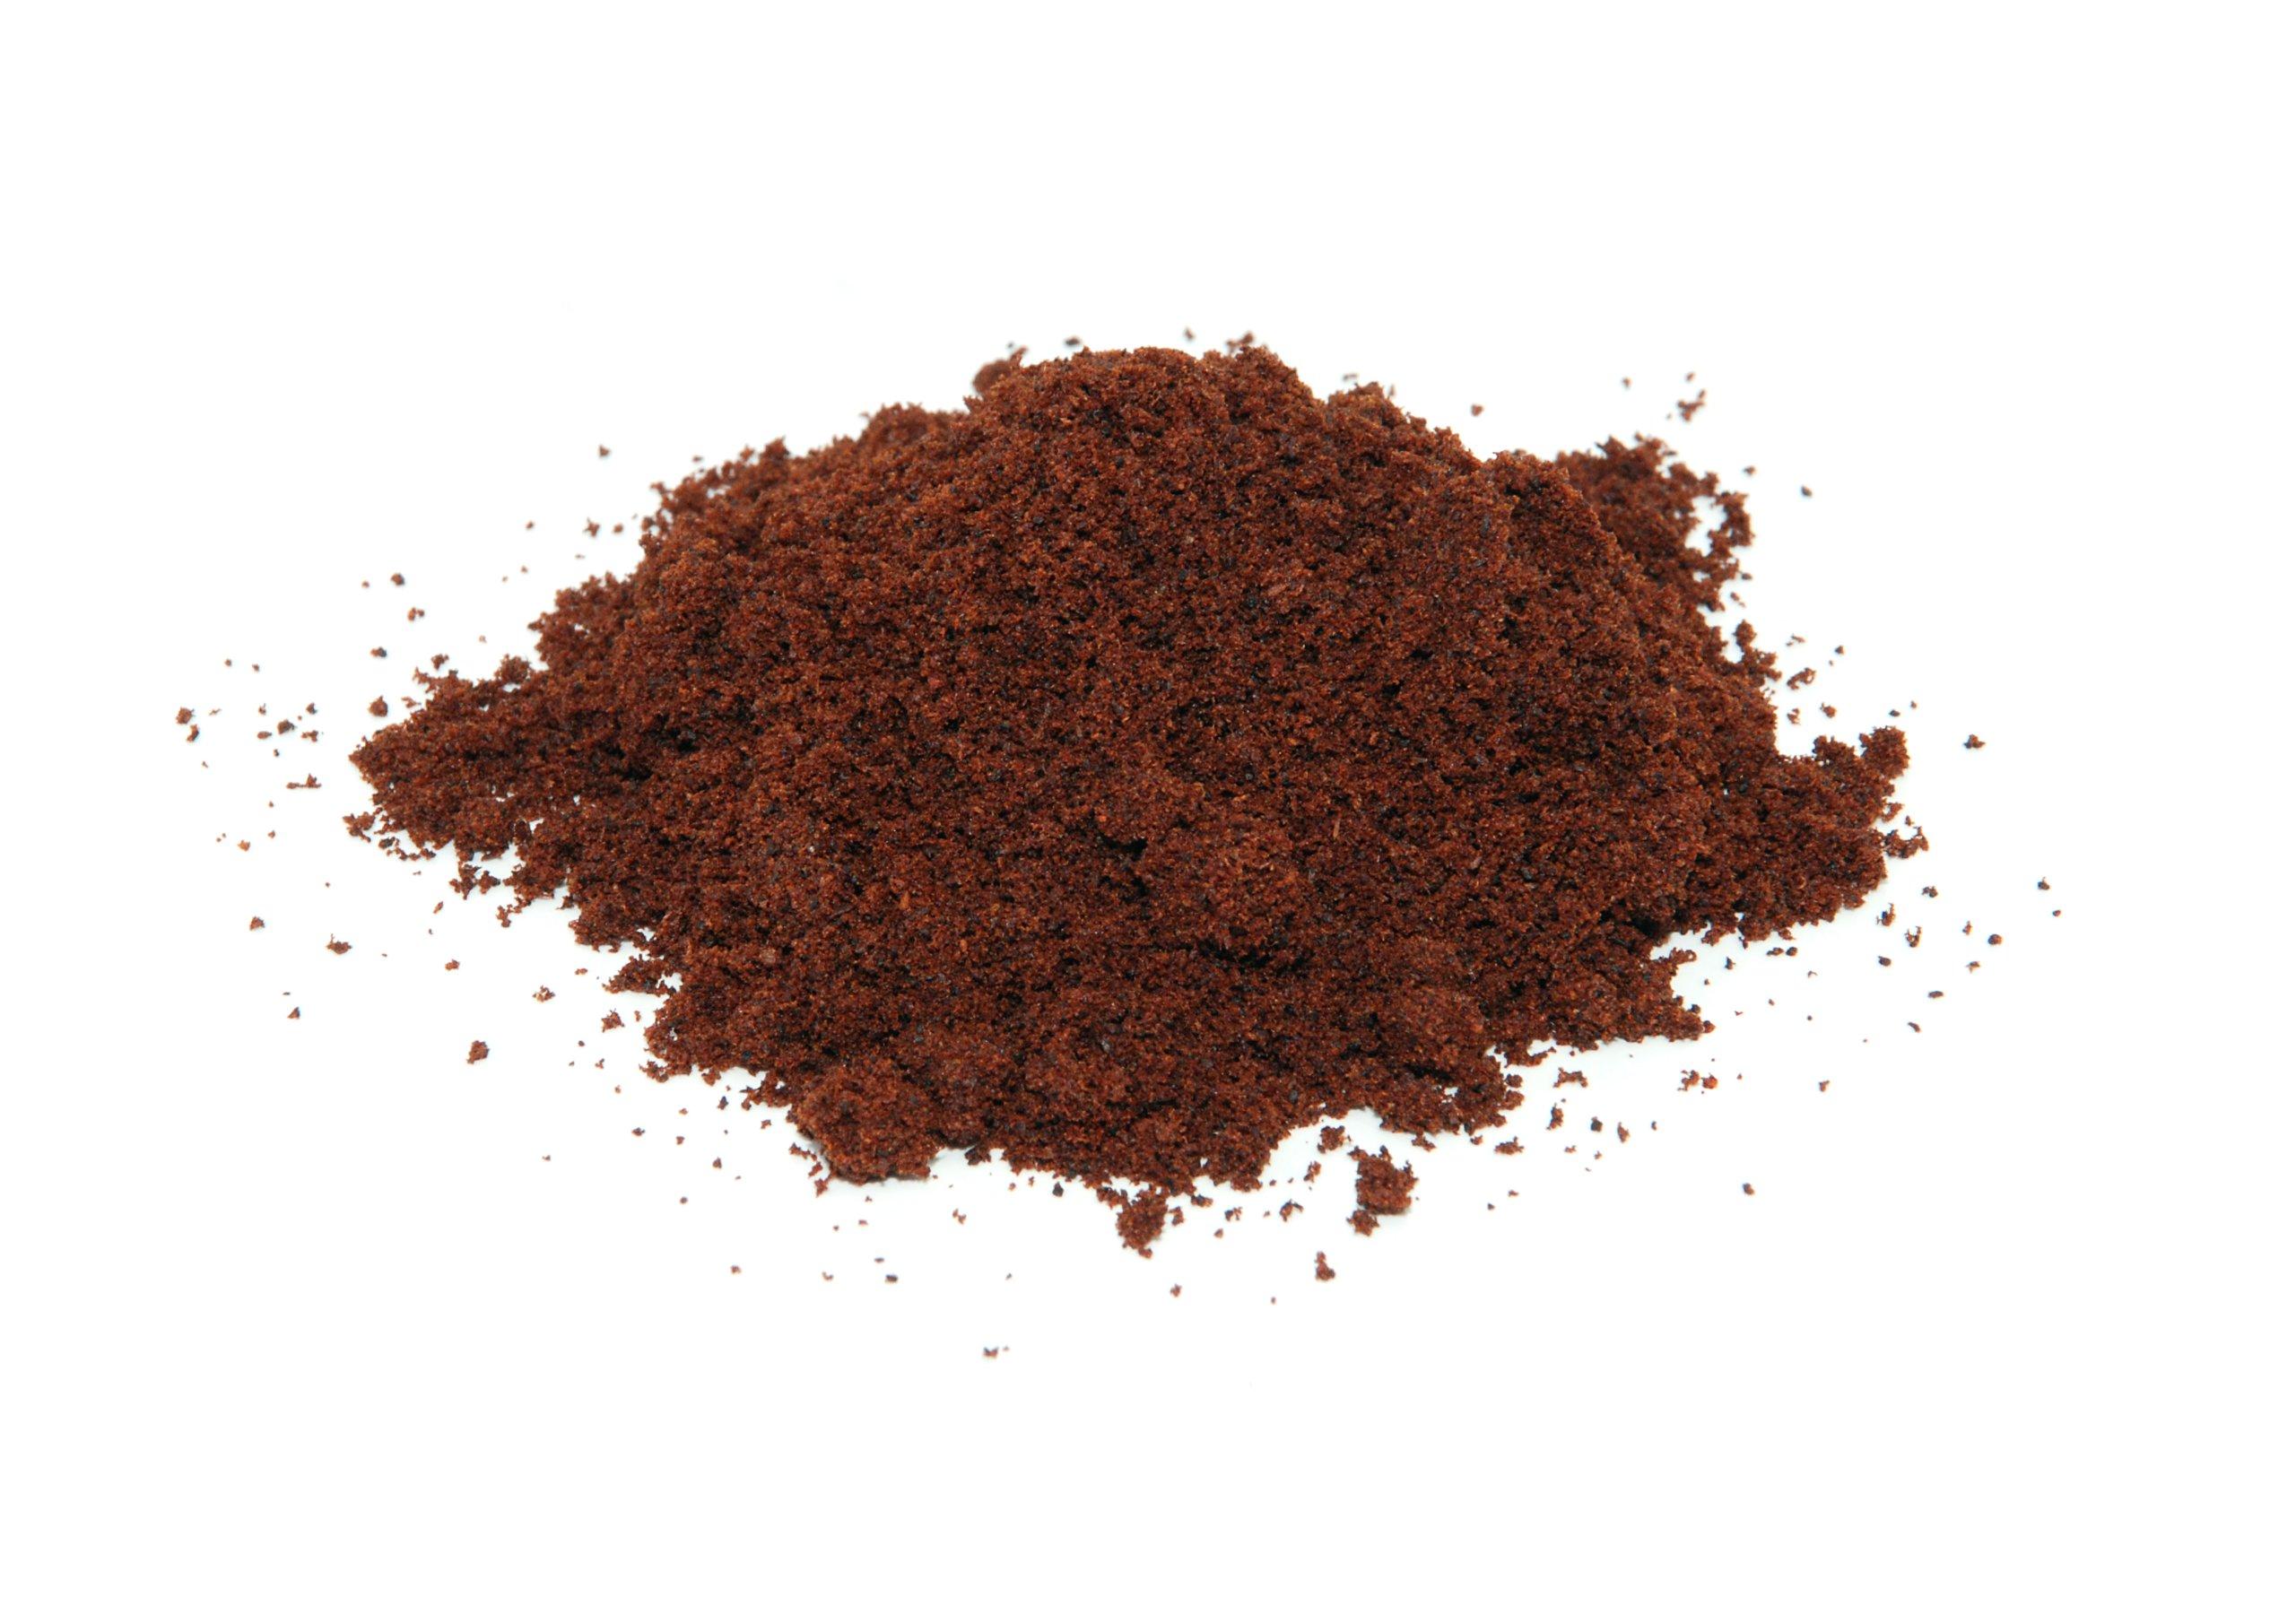 Bakto Flavors Gourmet Ground Cloves - 1 lb